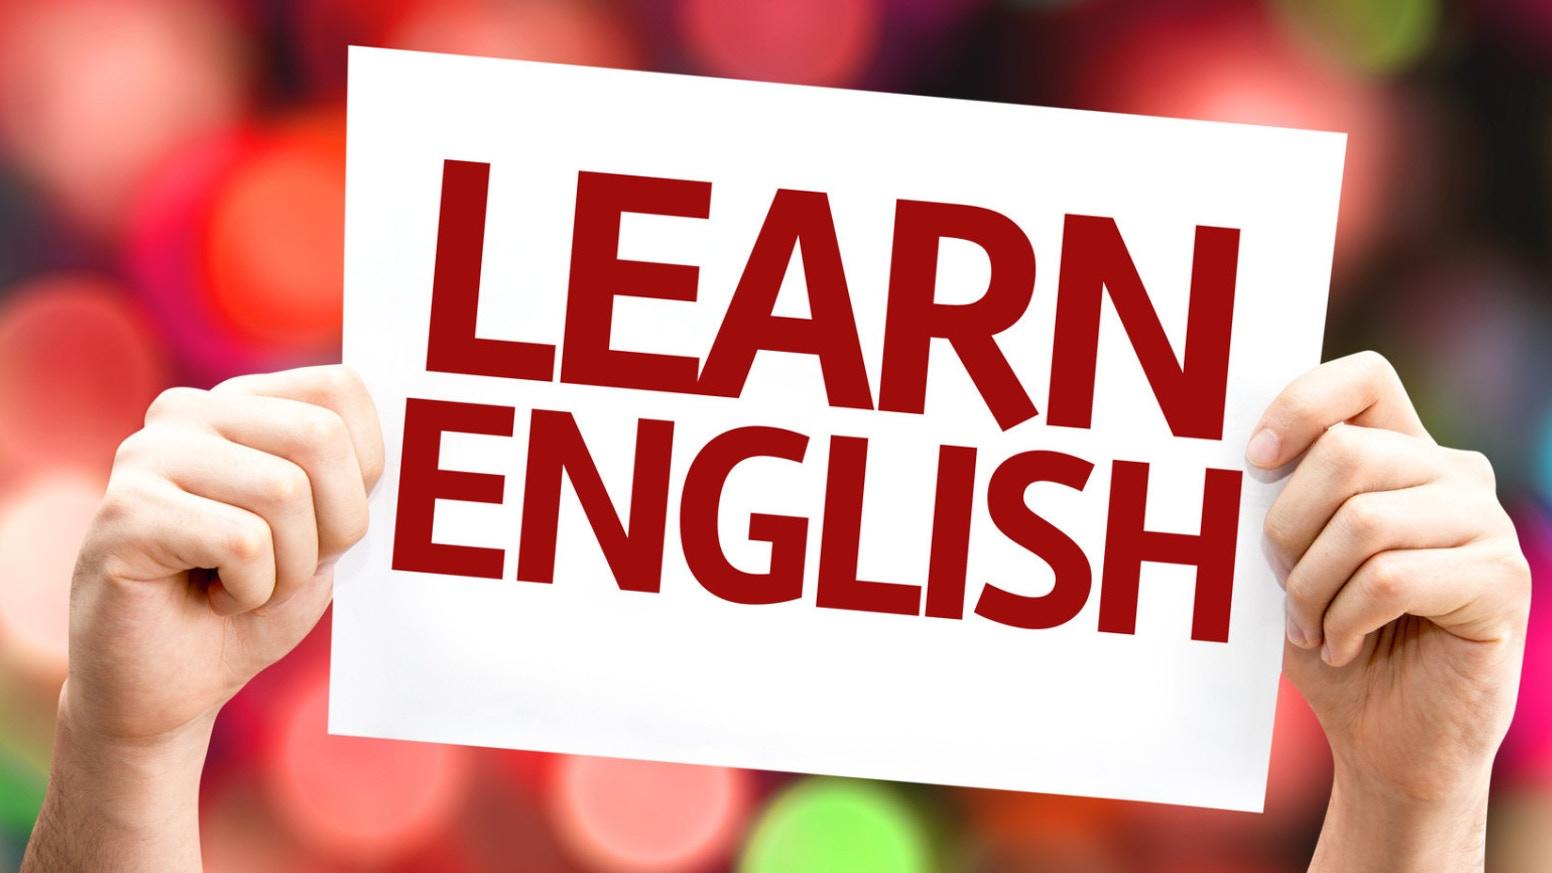 belajar bahasa inggris, belajar bahasa Inggris dewasa, les bahasa Inggris, bahasainggrisku, learn english